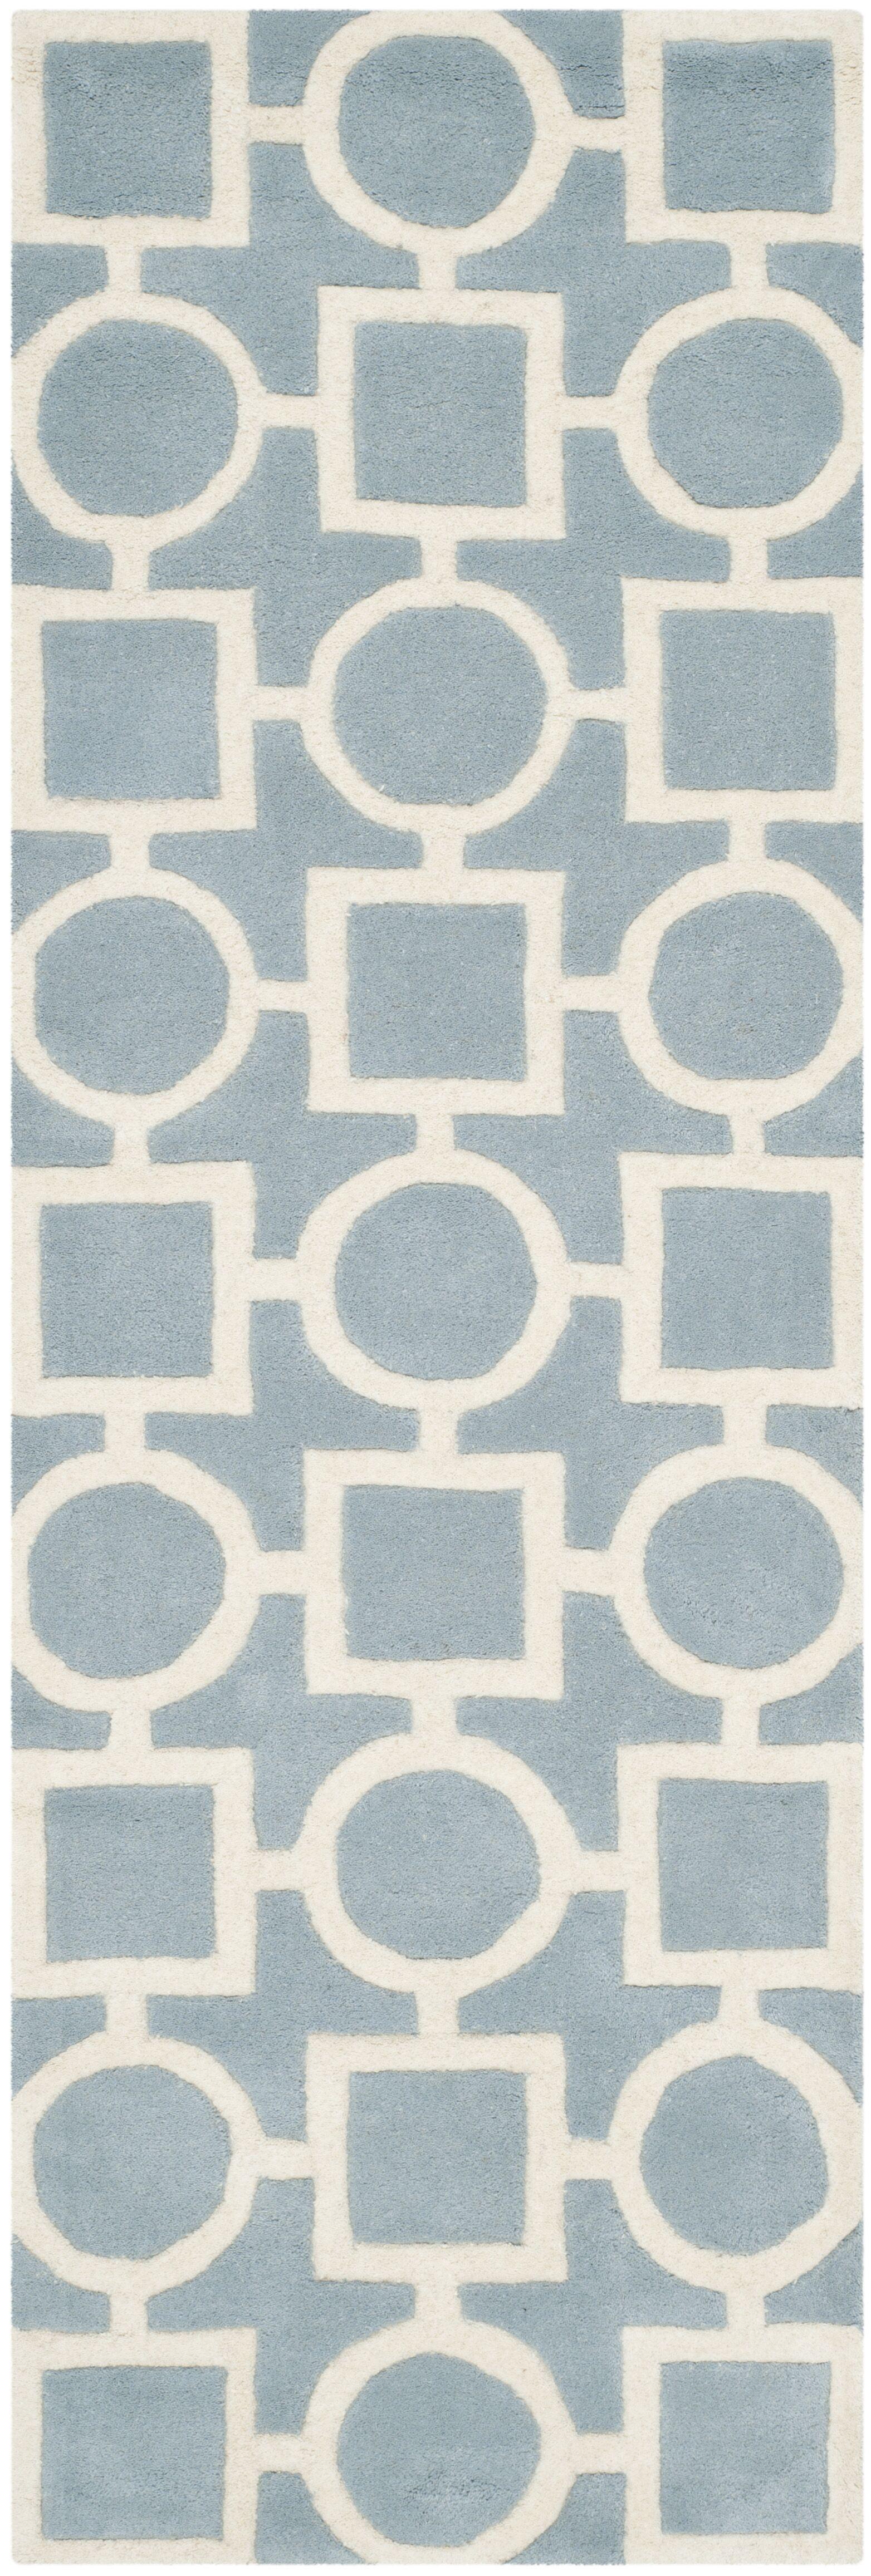 Wilkin Hand-Tufted Wool Blue/Ivory Rug Rug Size: Runner 2'3